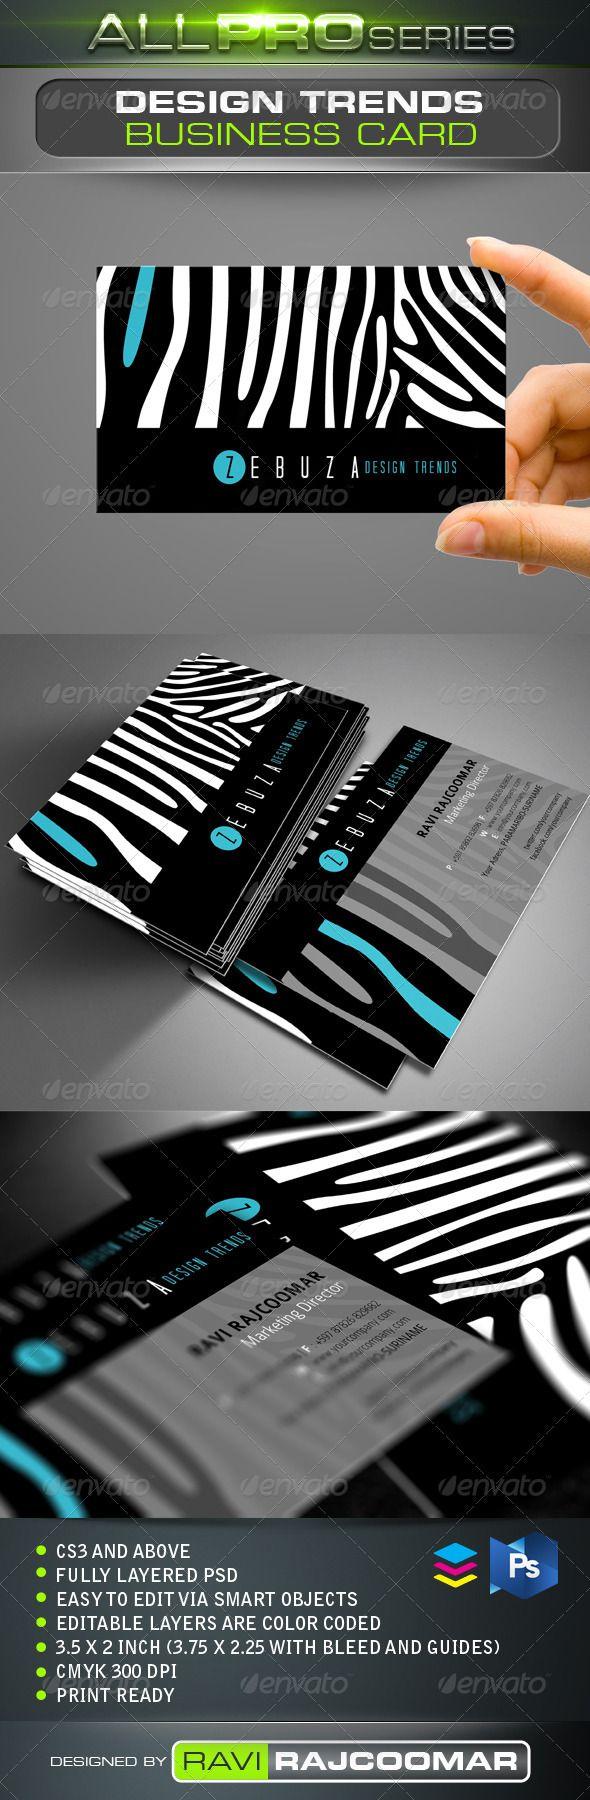 Design Trends Business Card